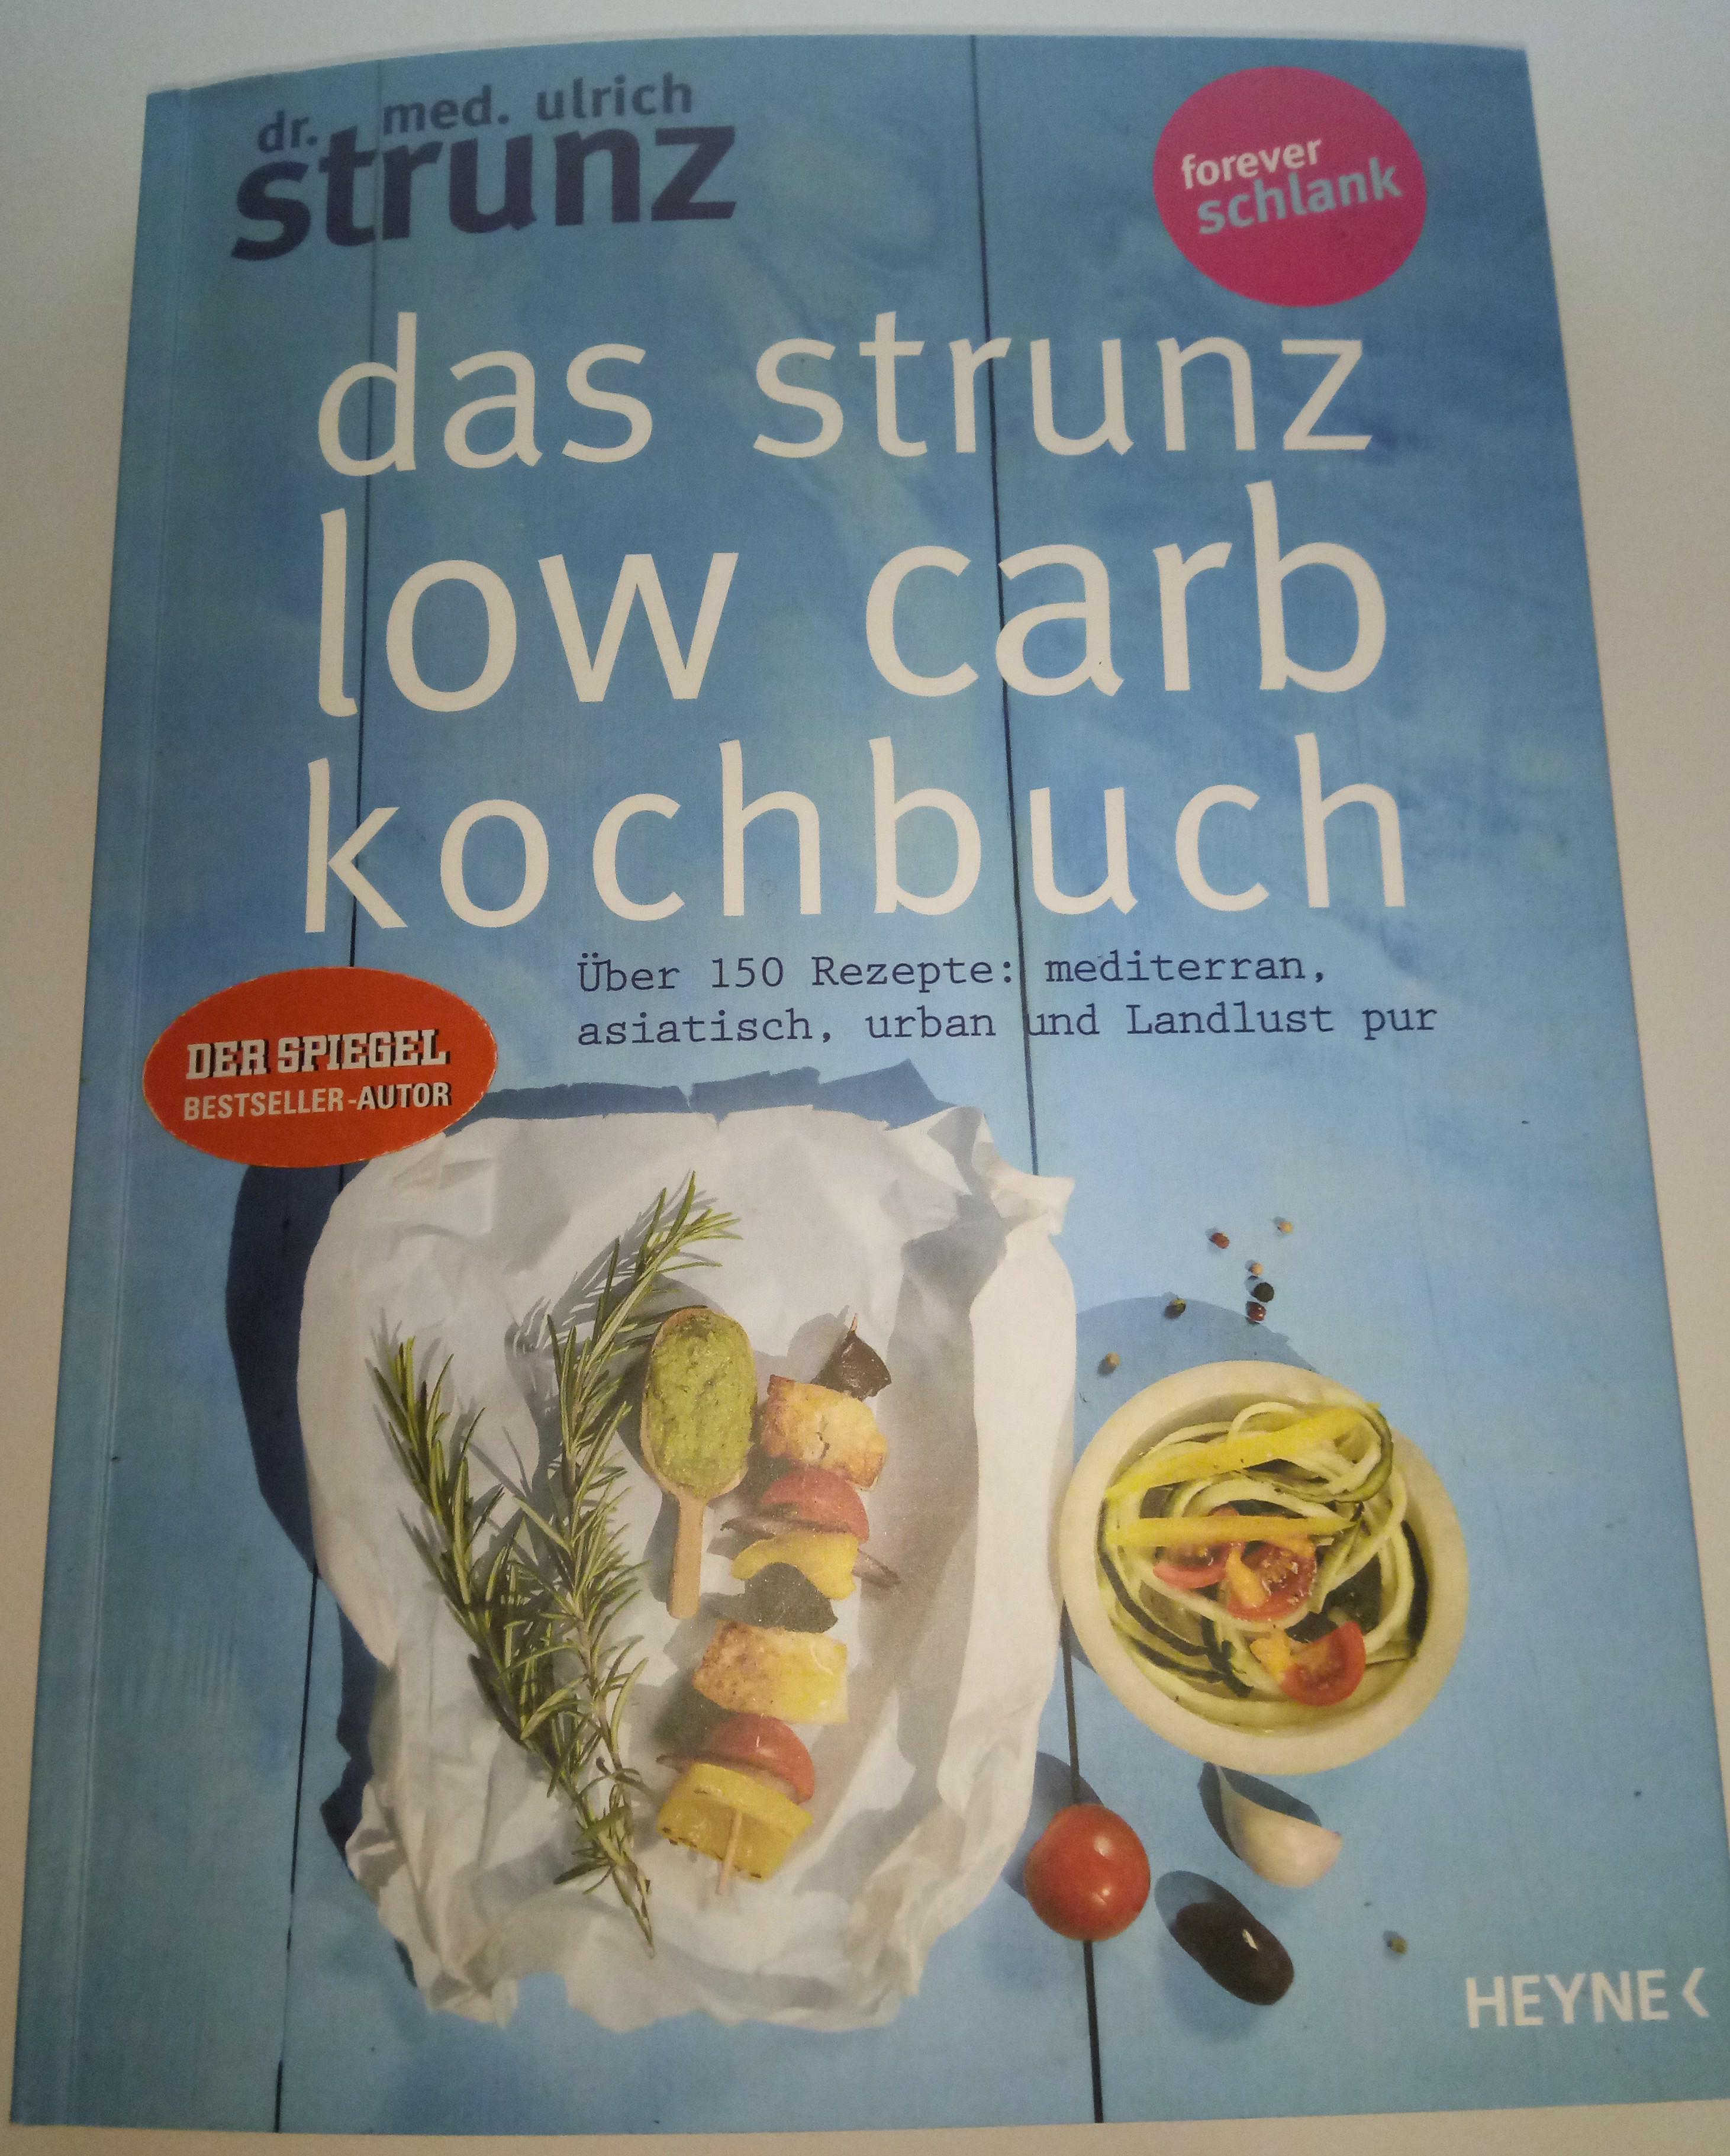 Das Strunz Low Carb Kochbuch